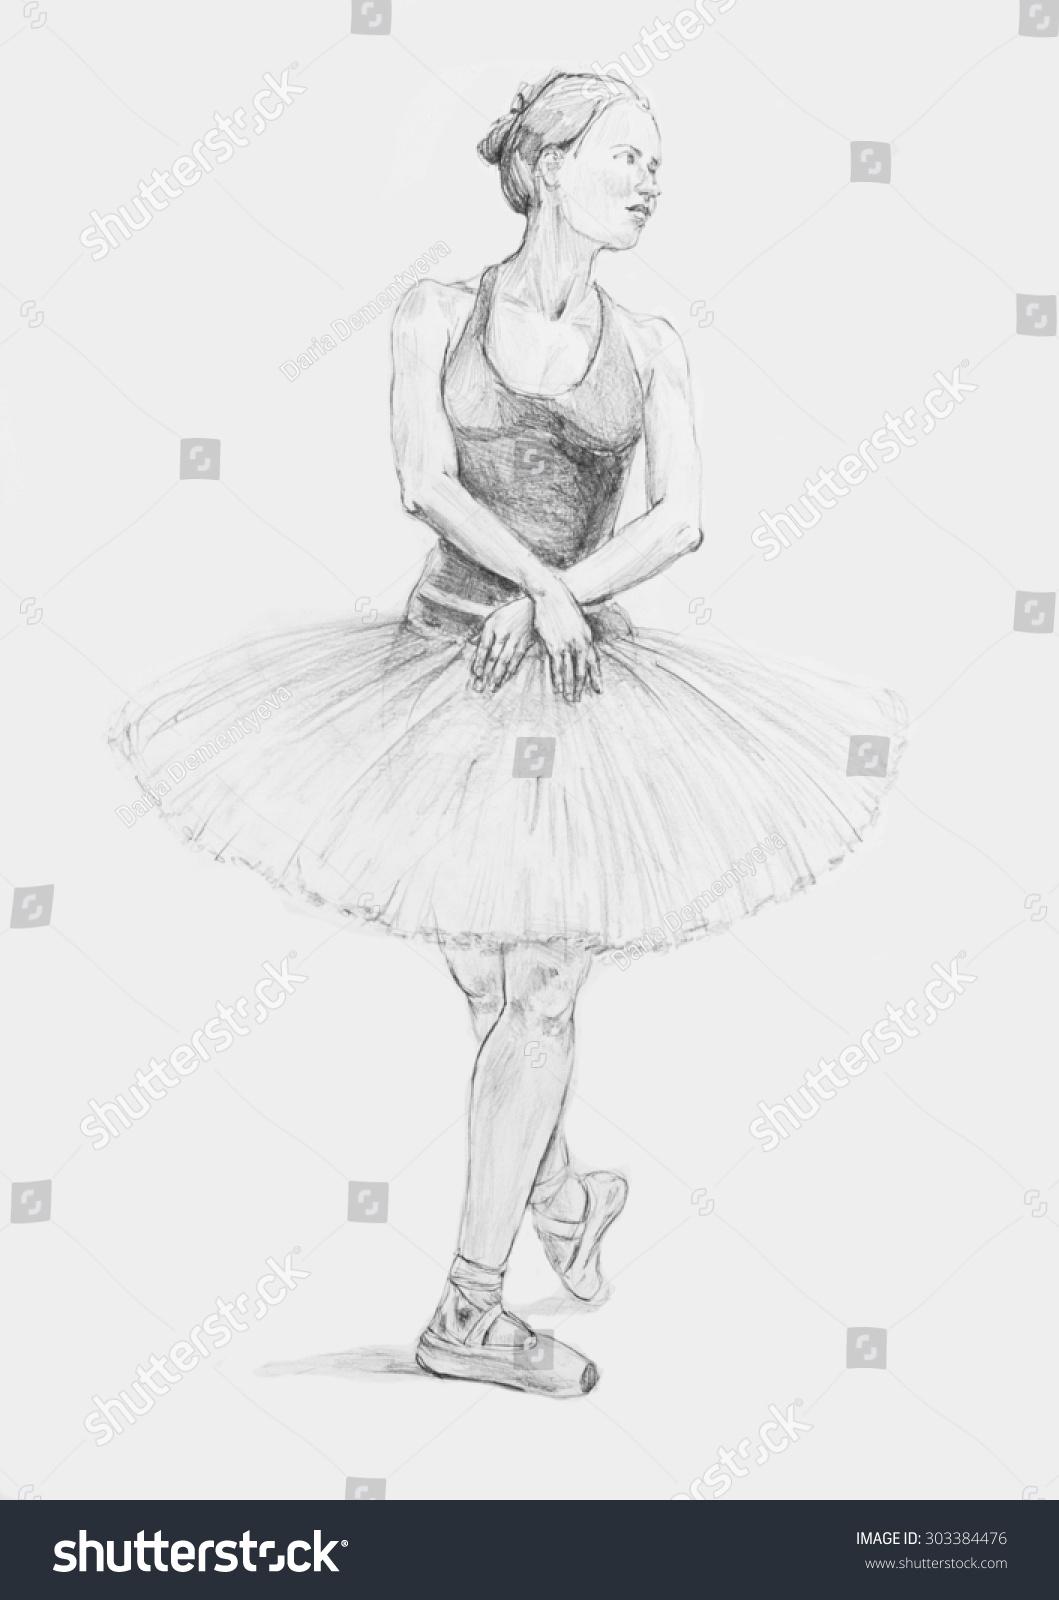 Dancing ballerina pencil drawing